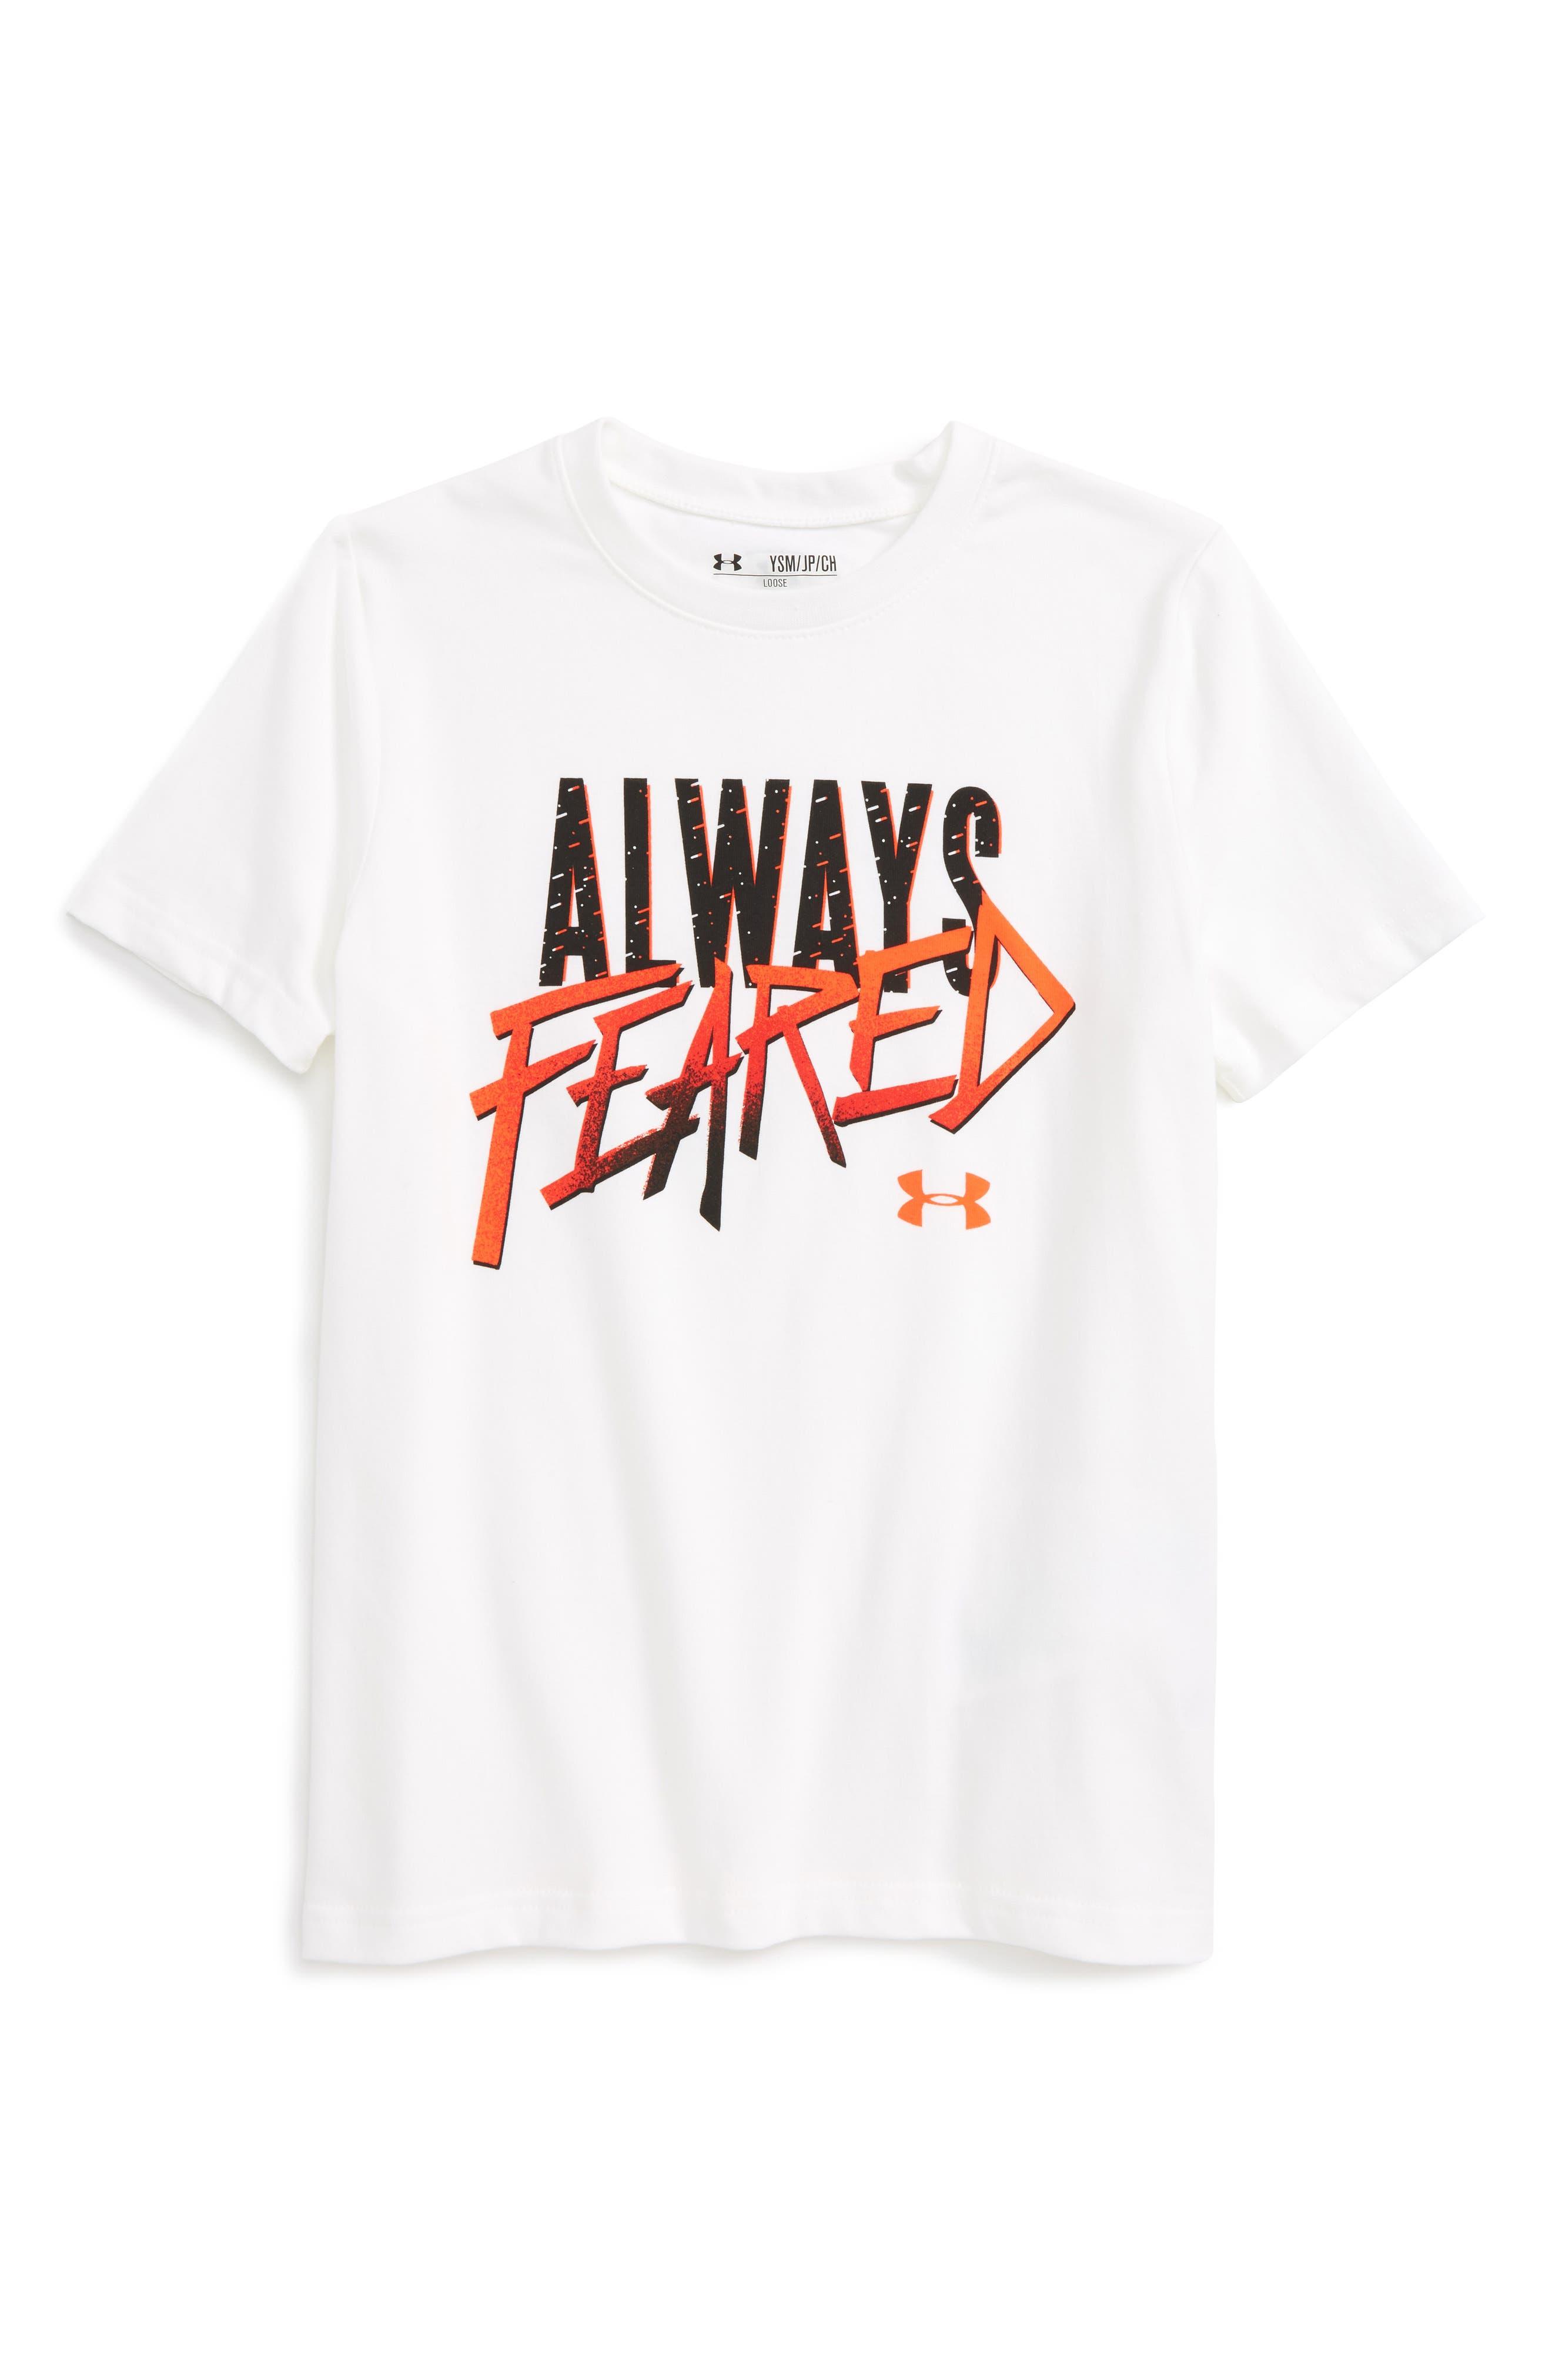 Under Armour Always Feared Graphic T-Shirt (Little Boys & Big Boys)